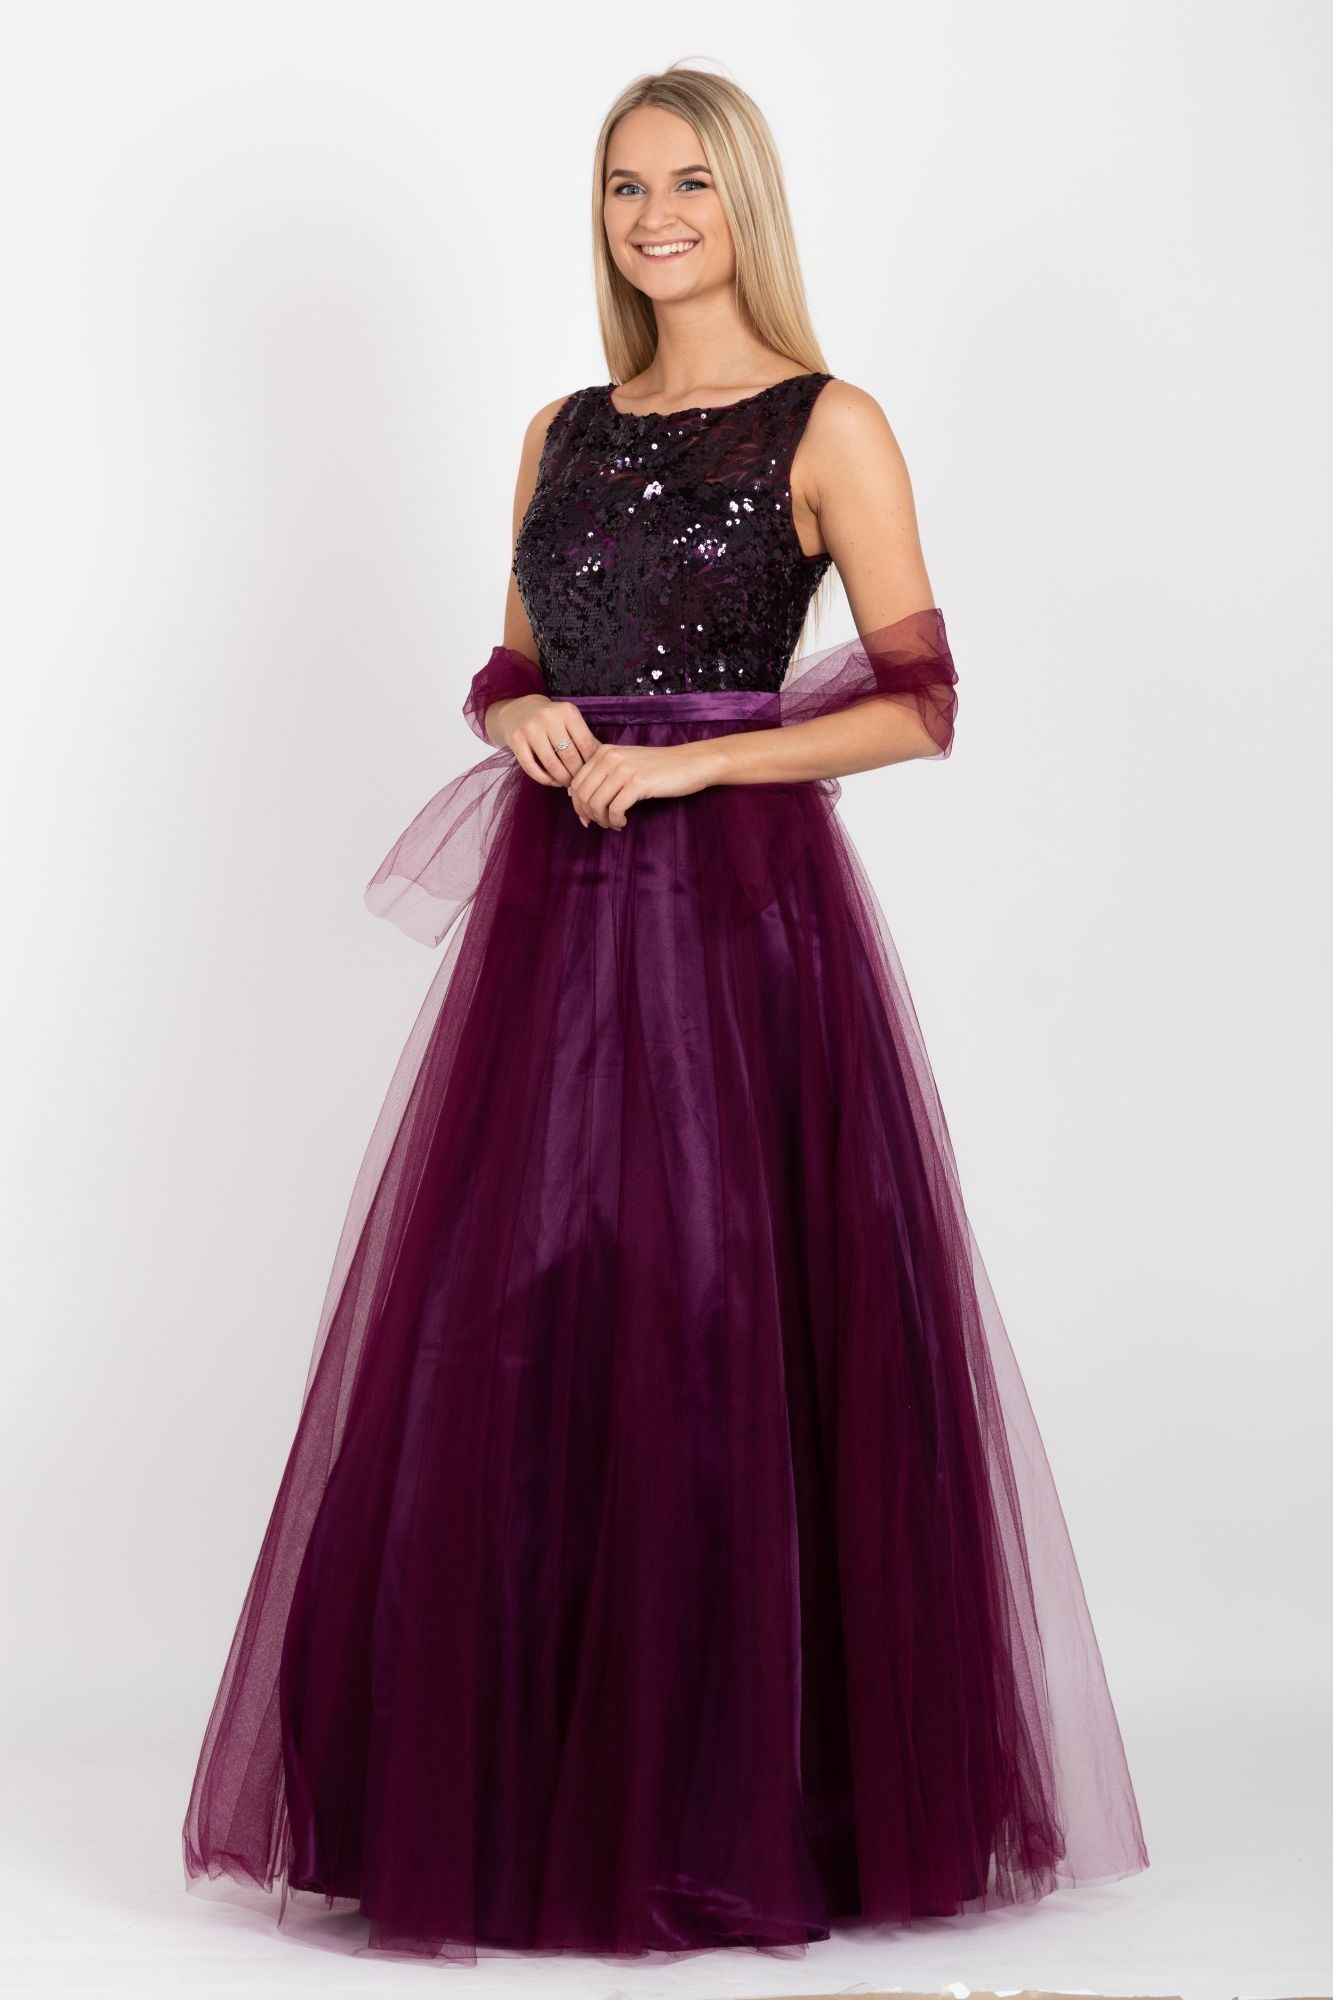 093d179a60e0 ... fialové Plesové šaty Plumlove